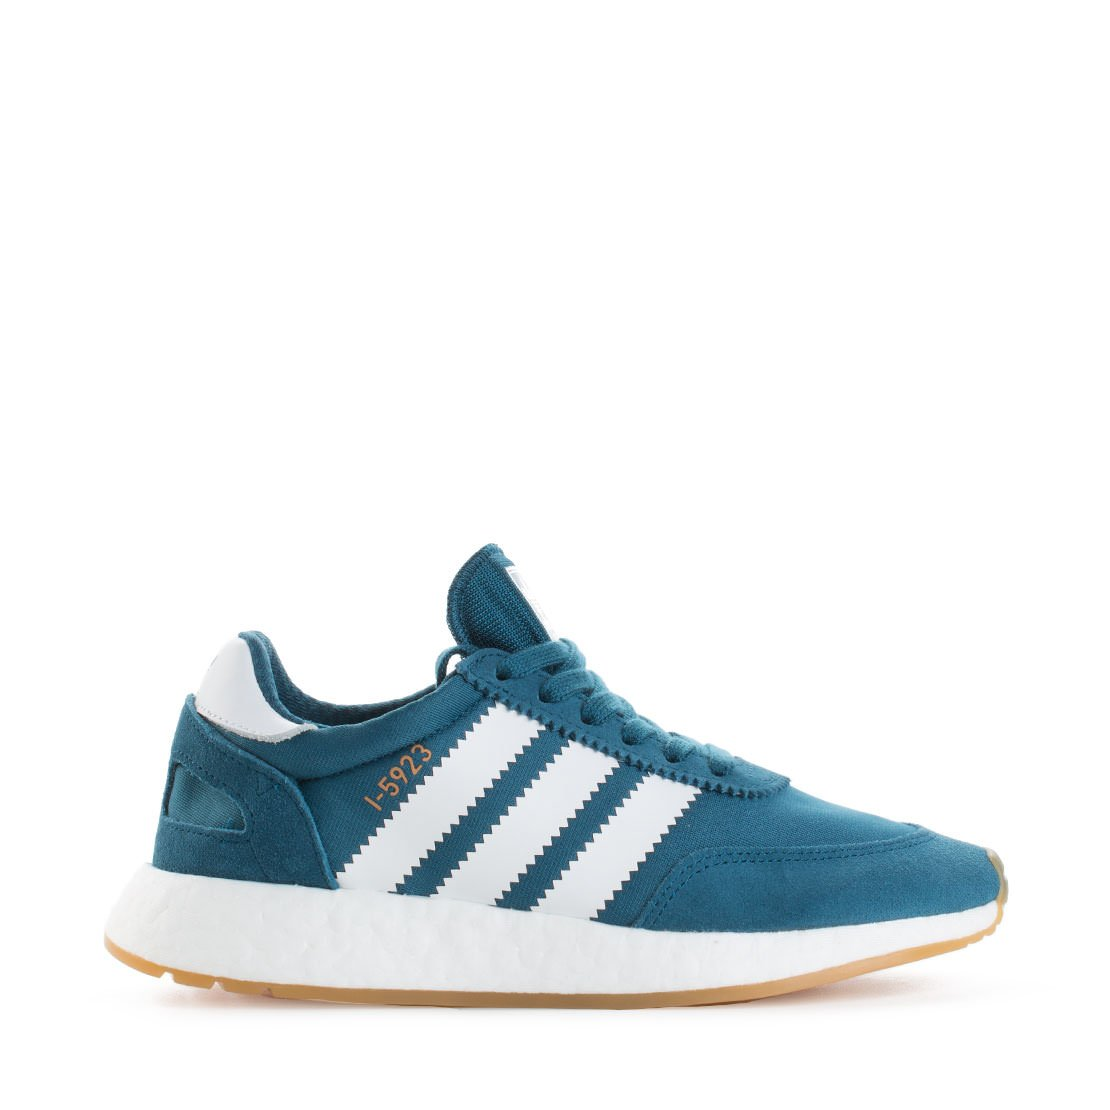 adidas Iniki Women's Off-White Sneakers B078TS99NK 7.5 M US|Blue / White